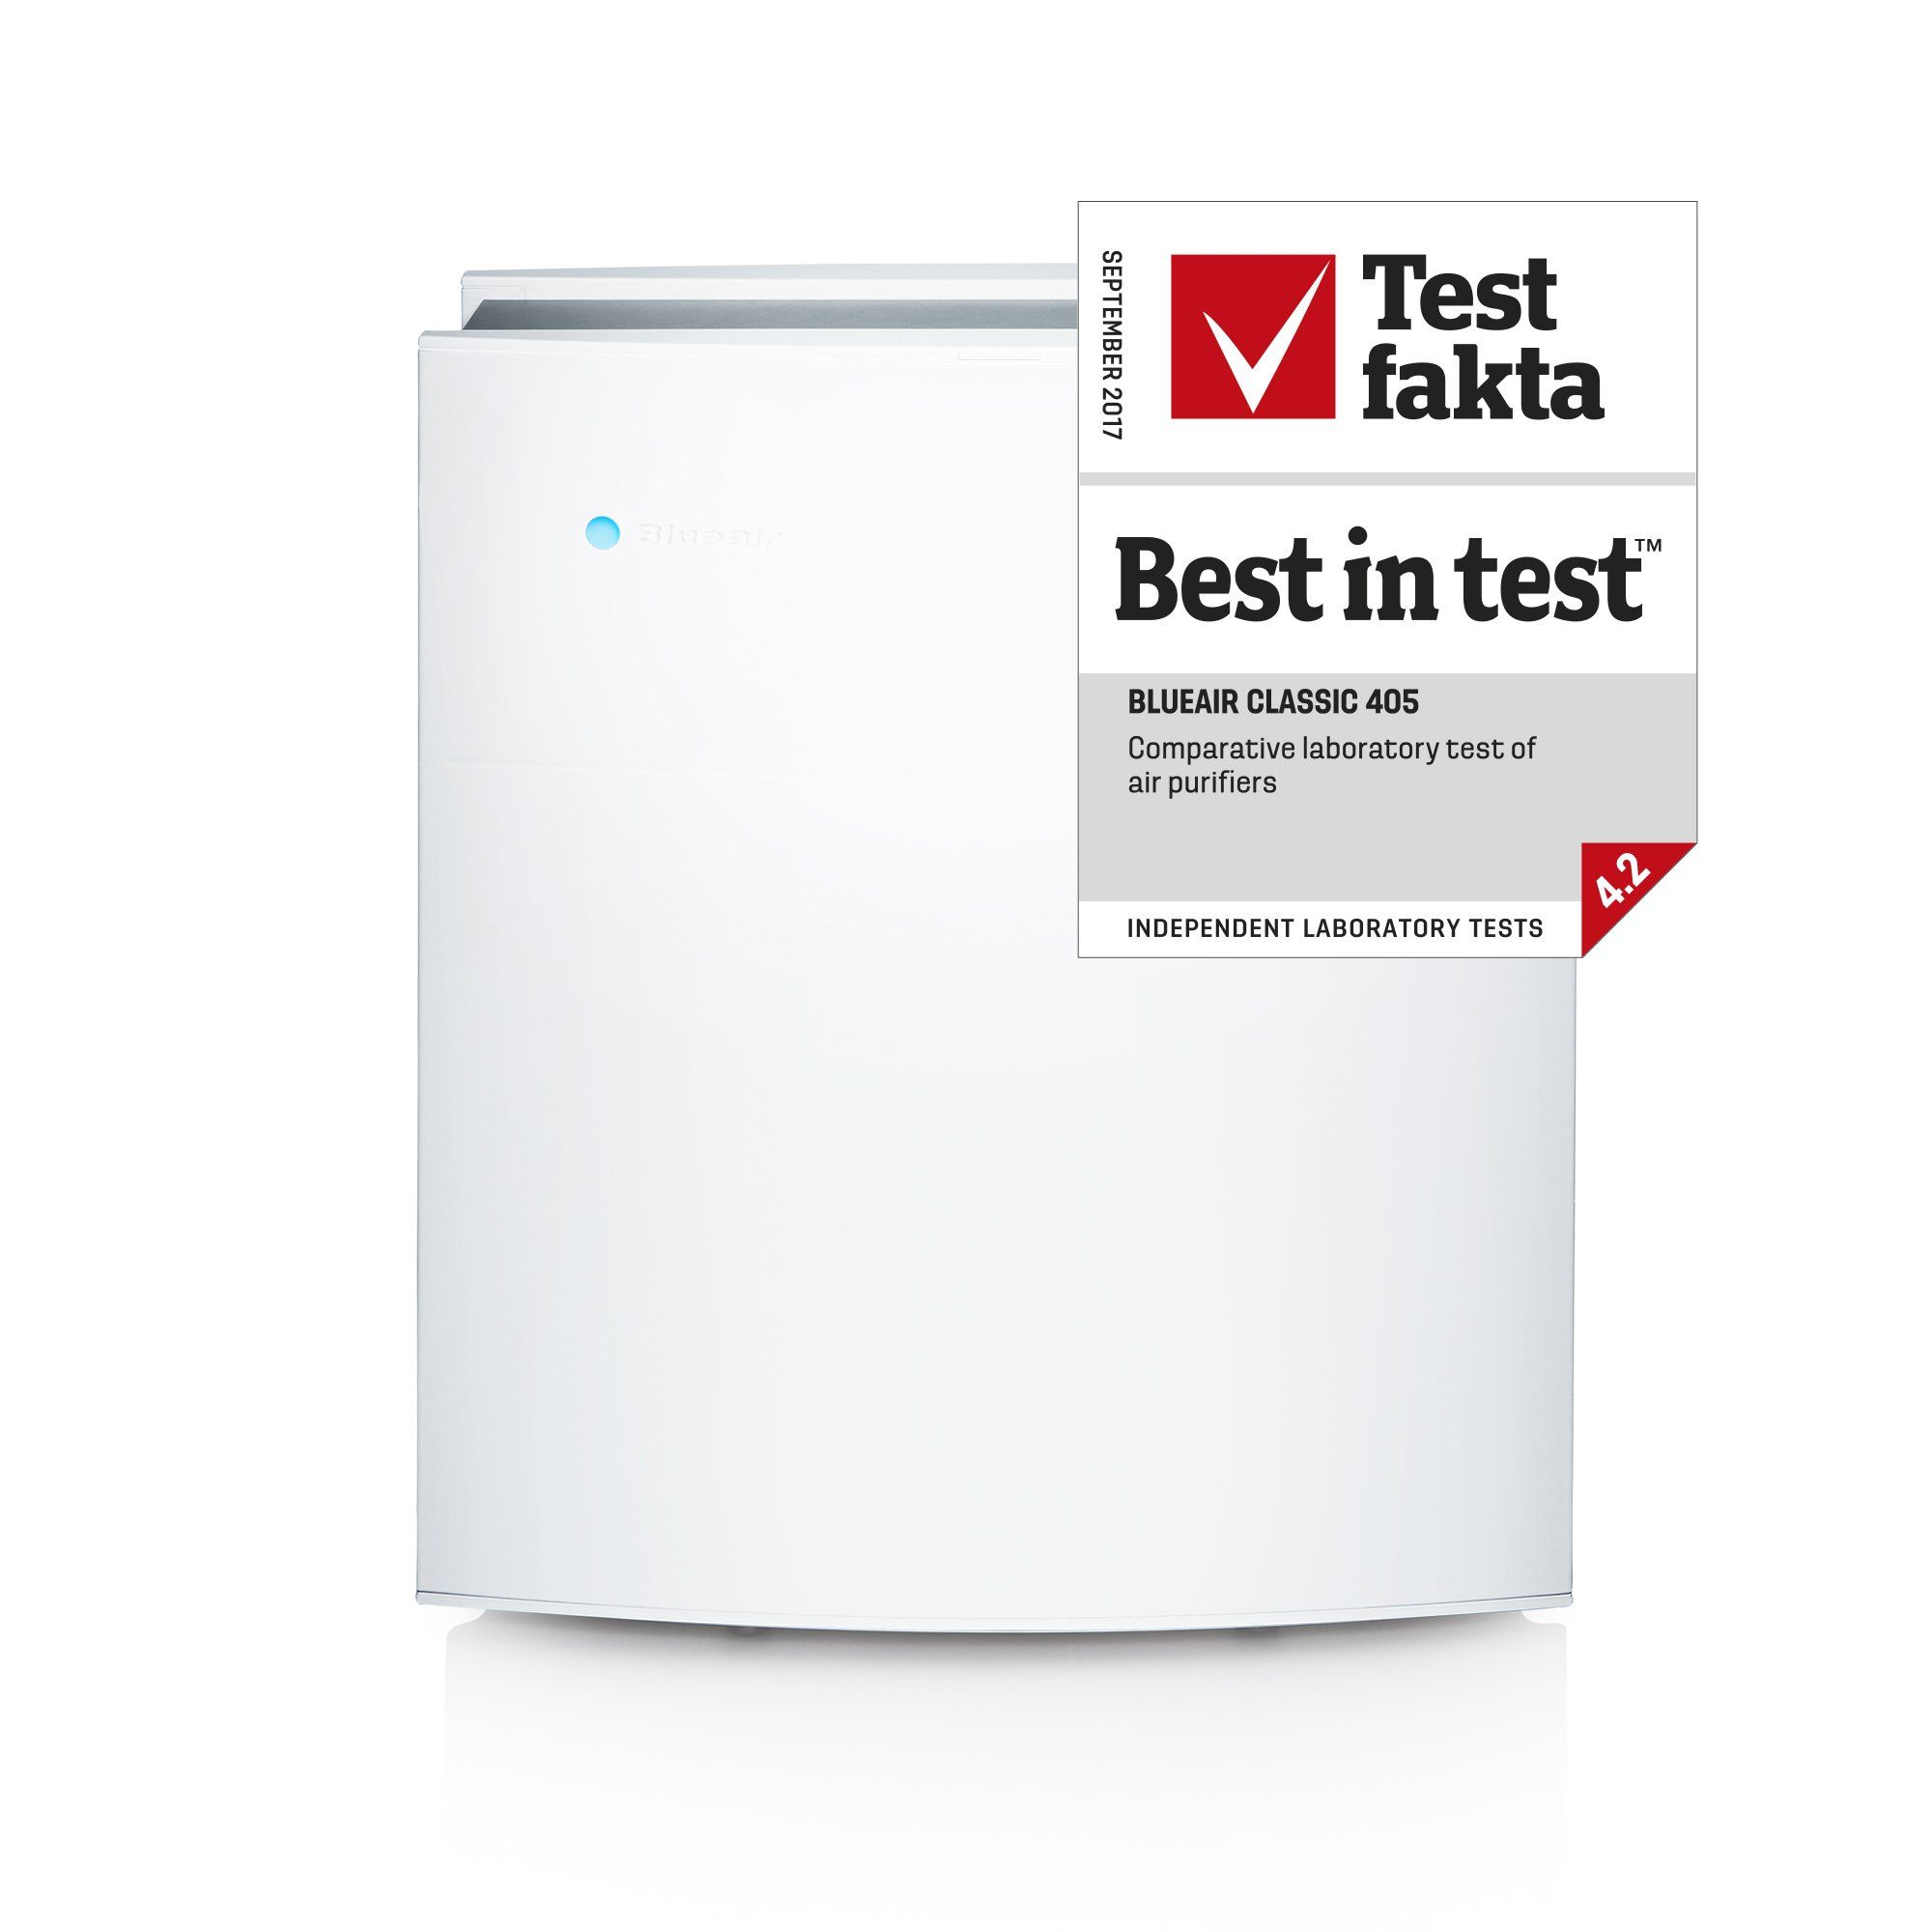 Bryant Carrier Ez Flex Filter Media Expxxfil0024 Air Conditioner Accessories Merv Flex